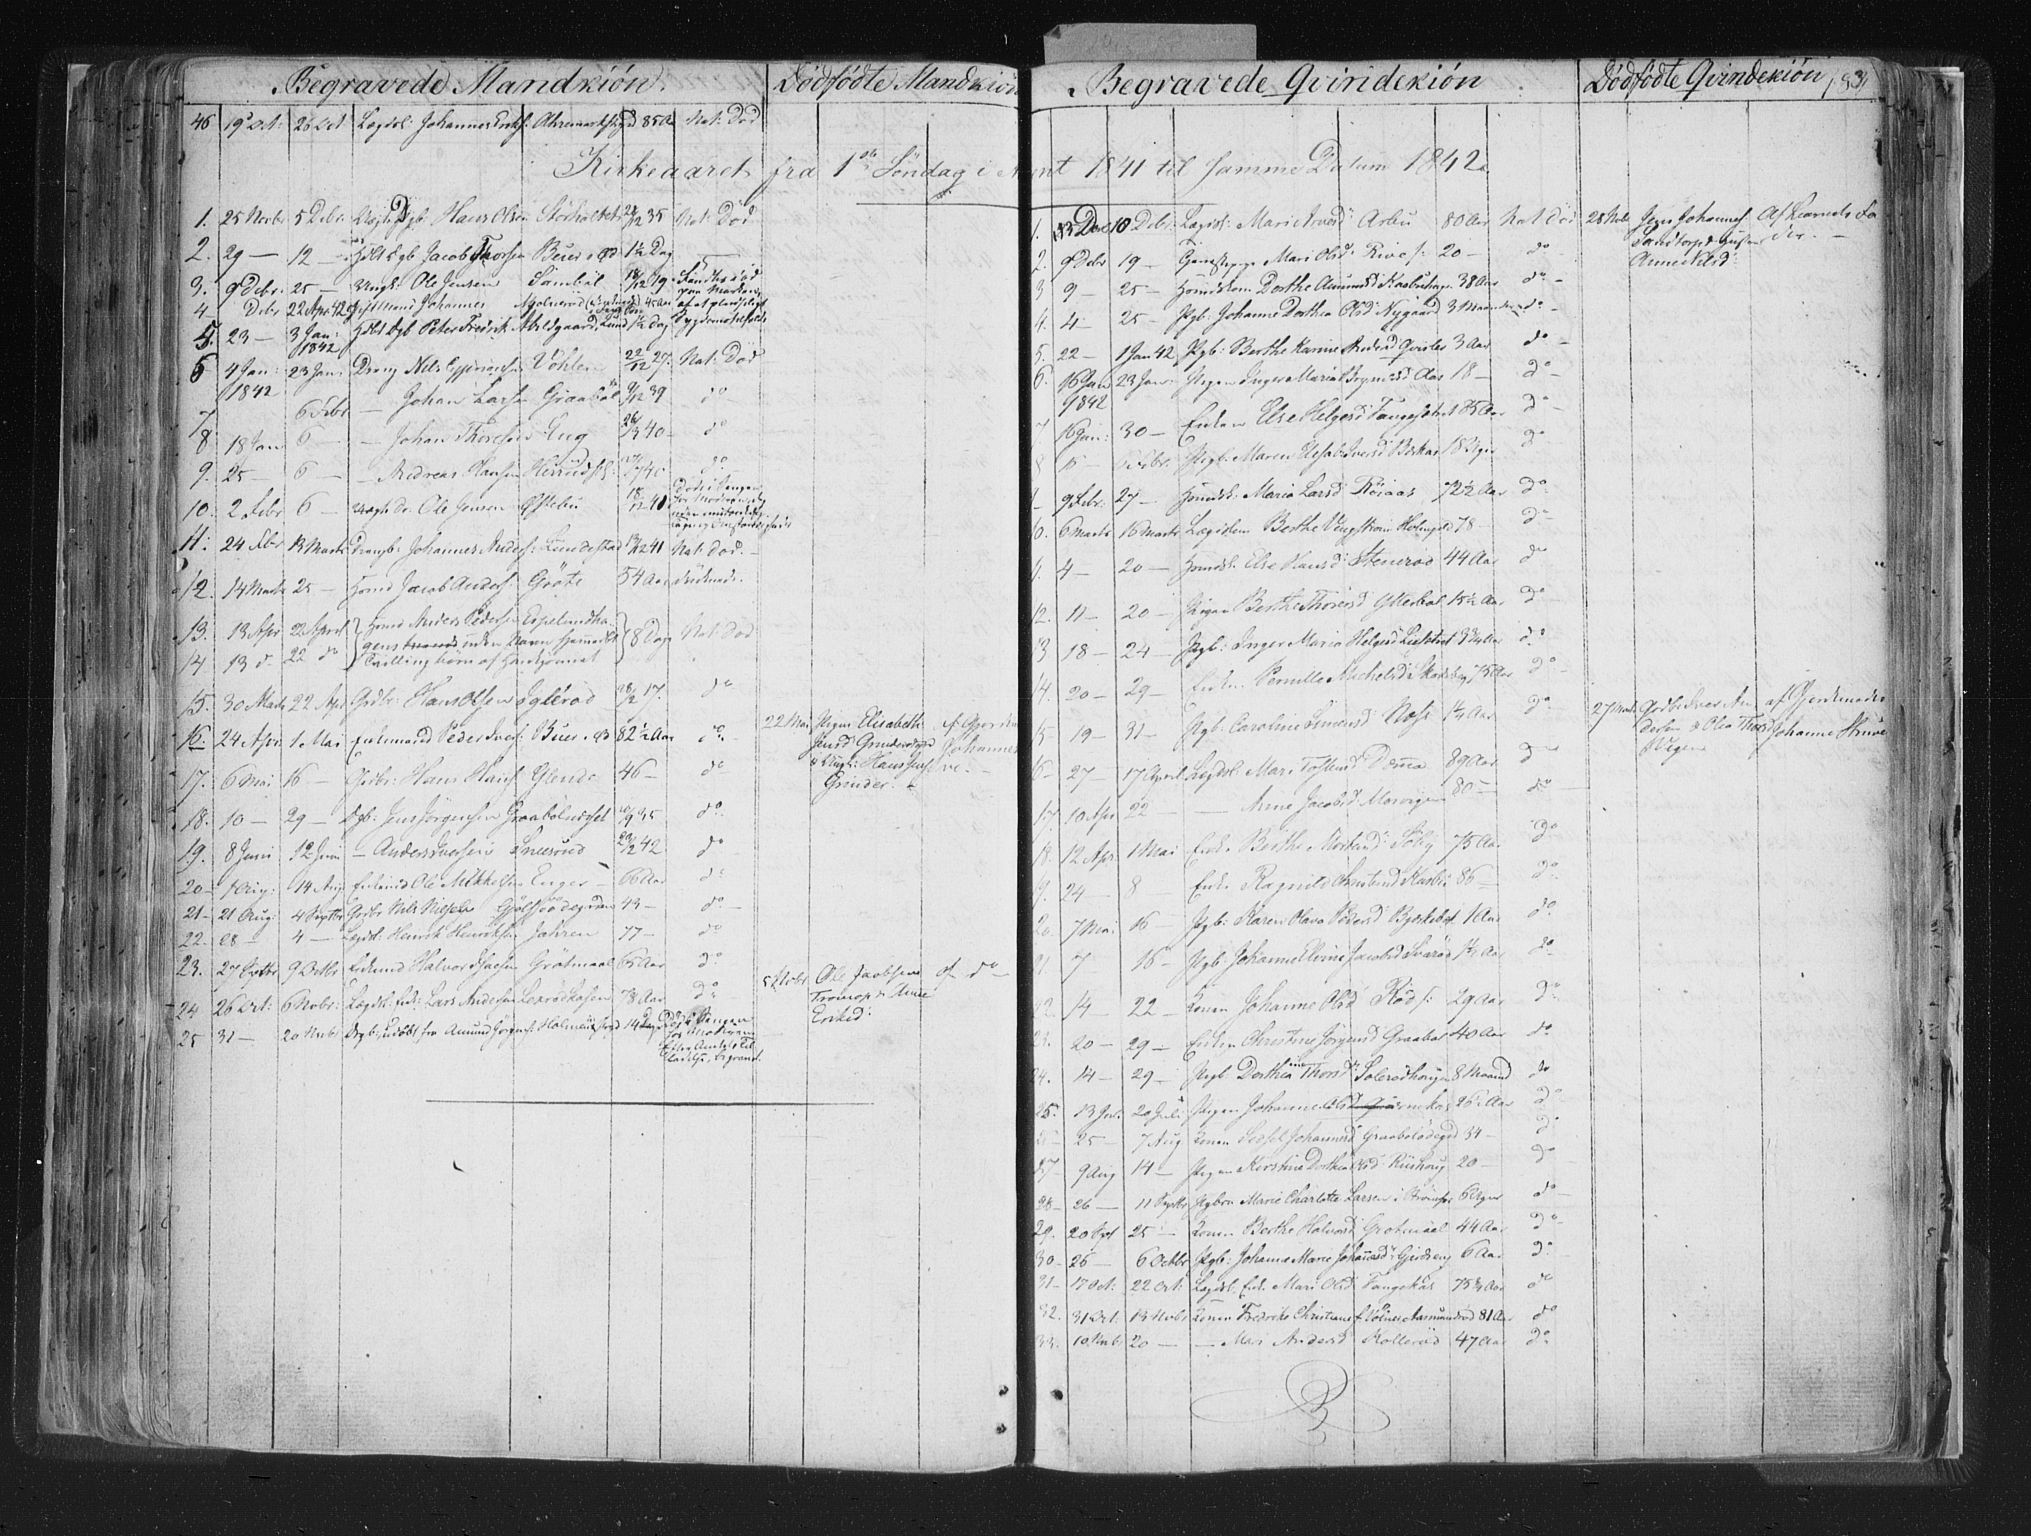 SAO, Aremark prestekontor Kirkebøker, F/Fc/L0002: Ministerialbok nr. III 2, 1834-1849, s. 183